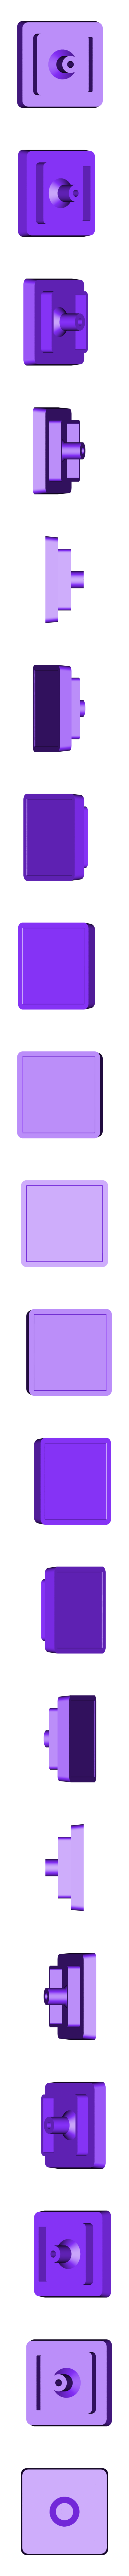 SparePart-Domy-Scraper-pyramid.stl Download free STL file Spare Part for Domy Scraper Pyramid • 3D printer object, Ogubal3D